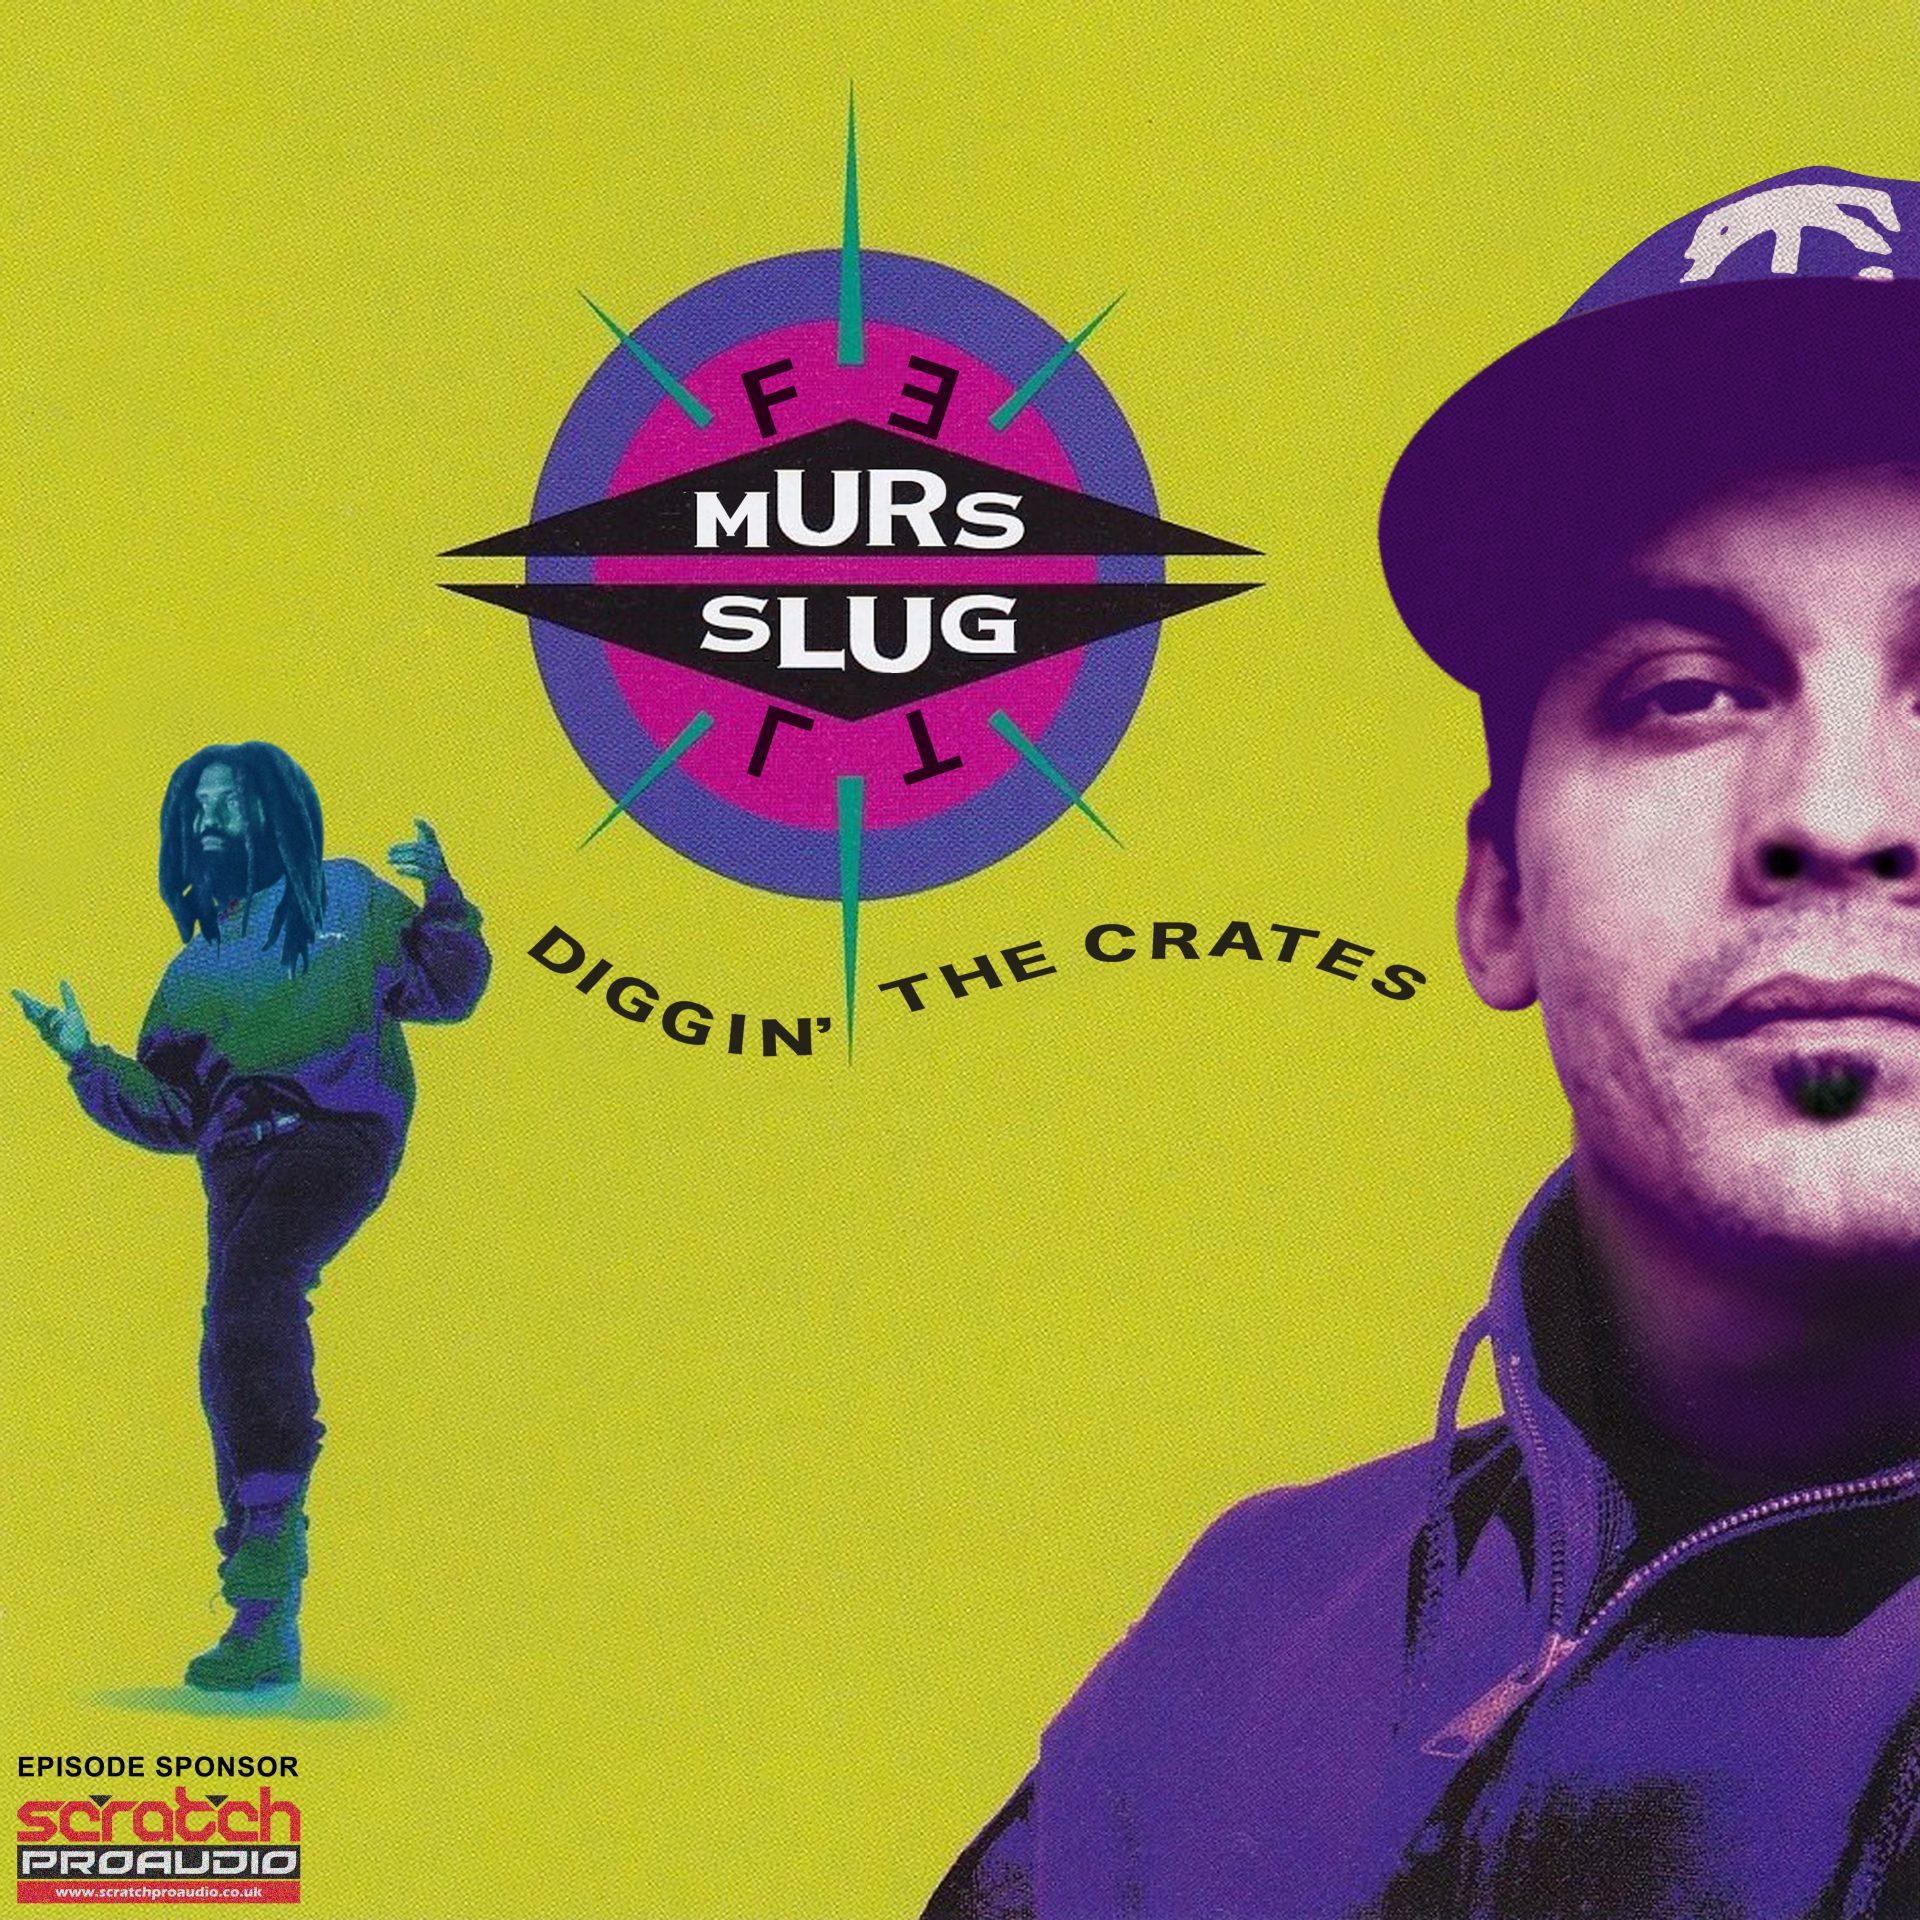 Episode 2 of our Diggin' The Crates Podcast: FELT (Slug & Murs)